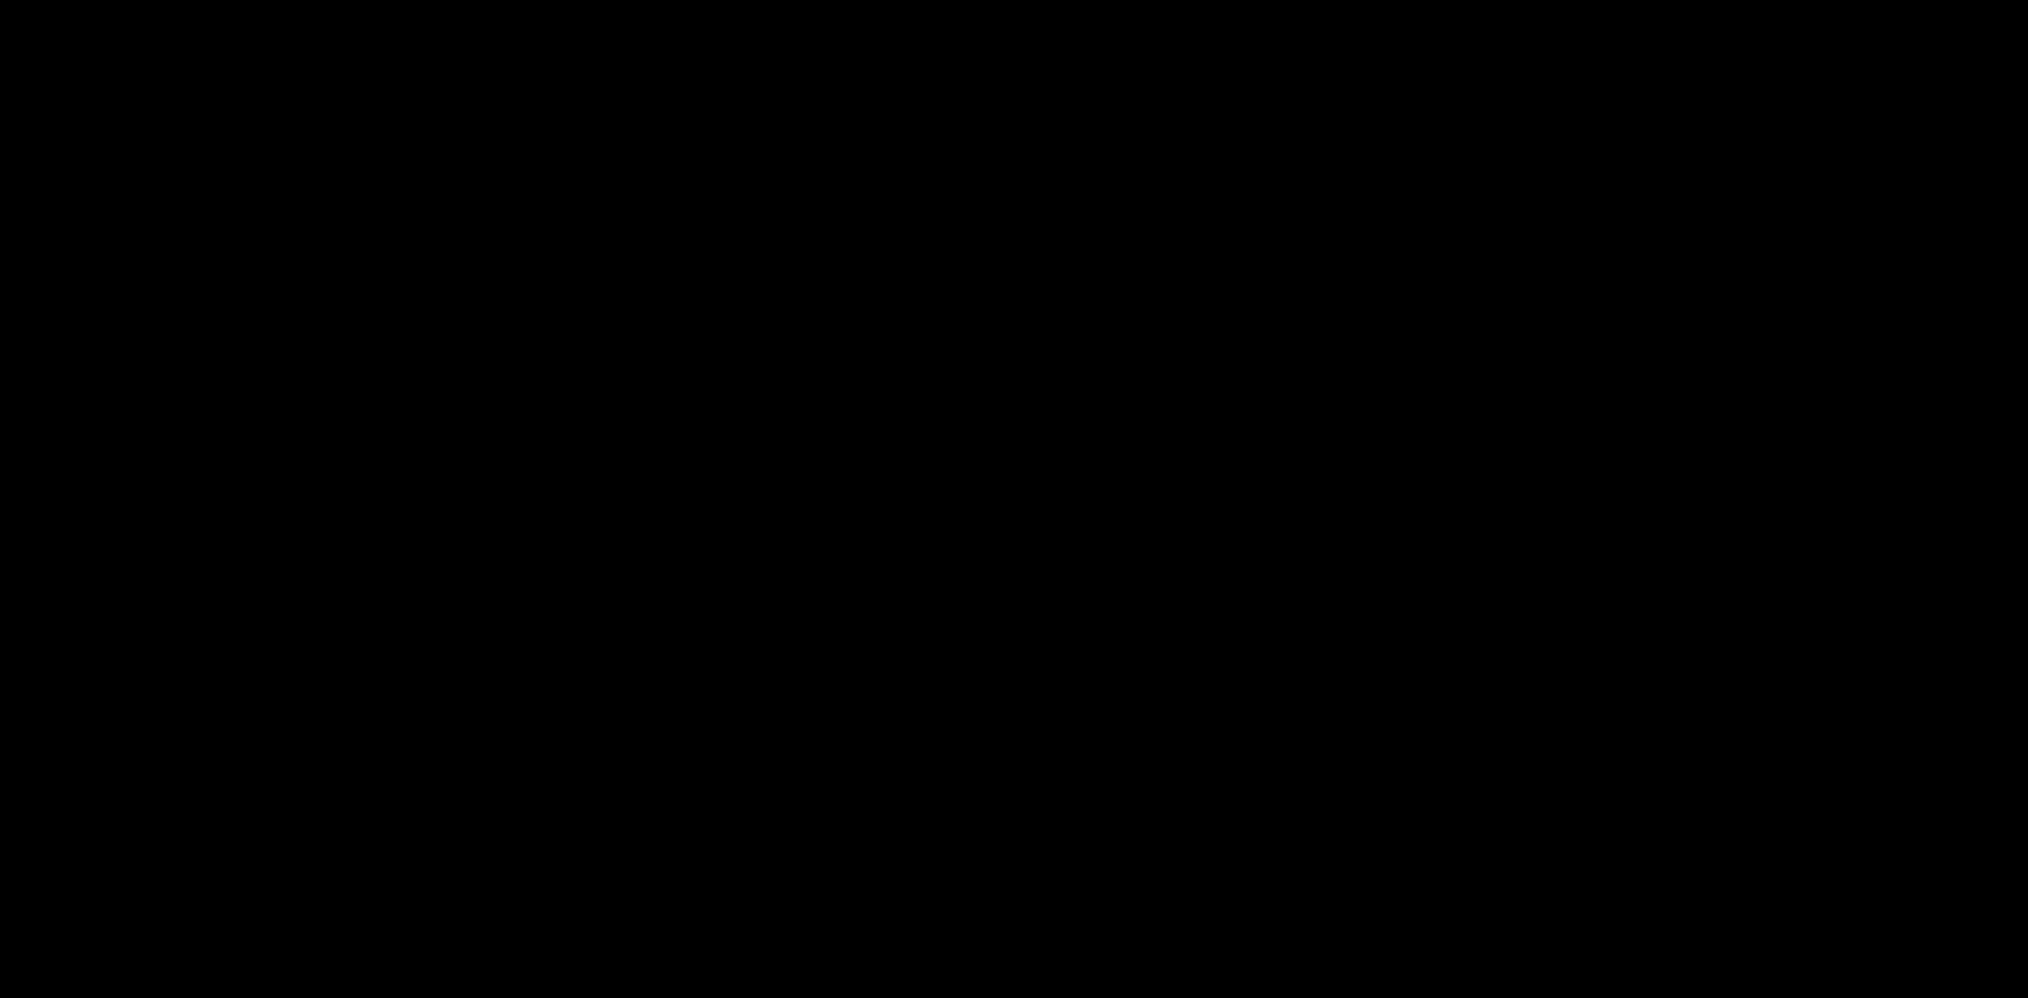 Jw logo zwart